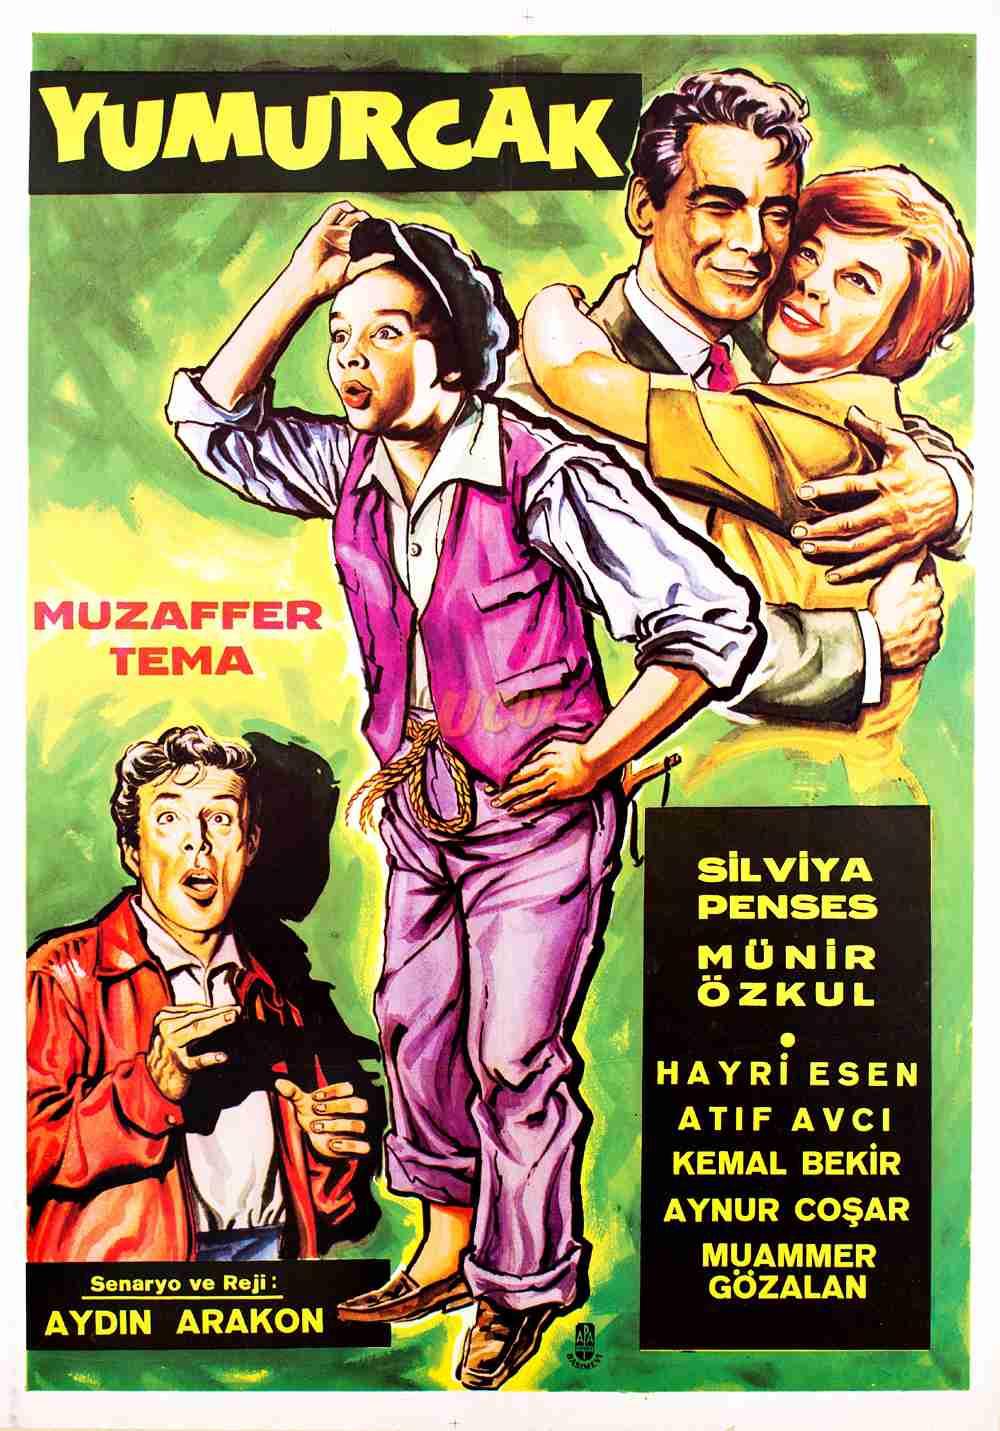 yumurcak_1961-3